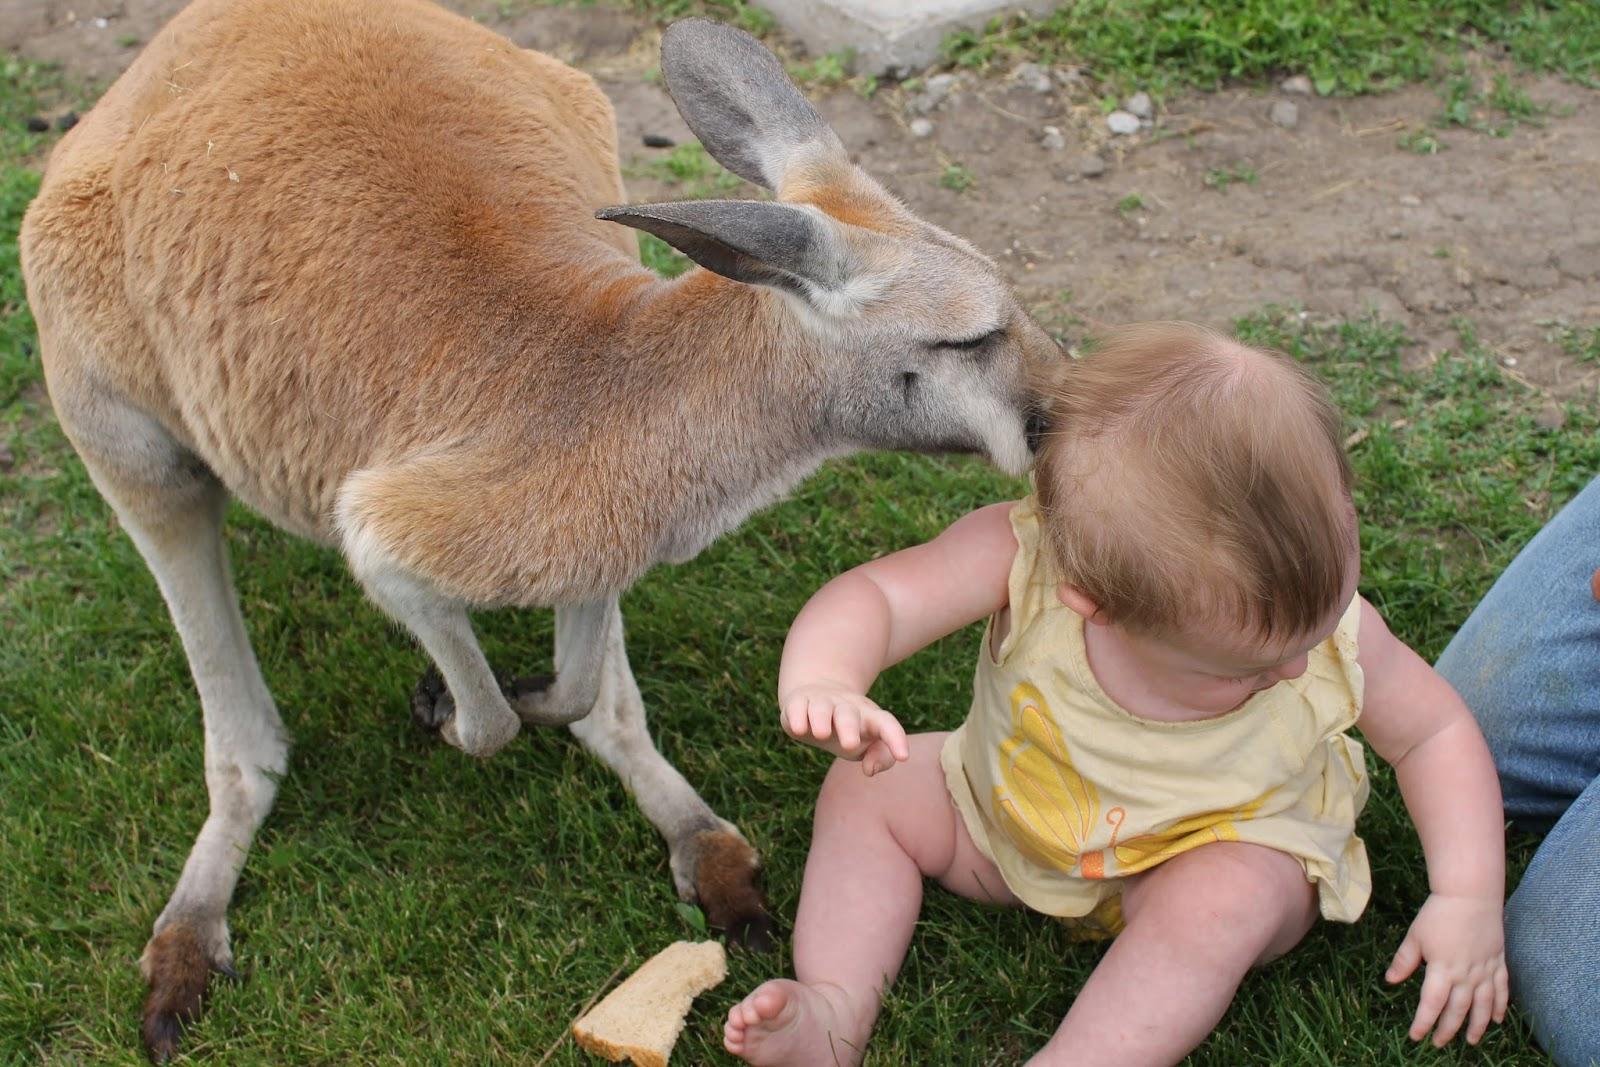 Hansen's Dairy Farm, Hudson, Iowa - Kangaroo